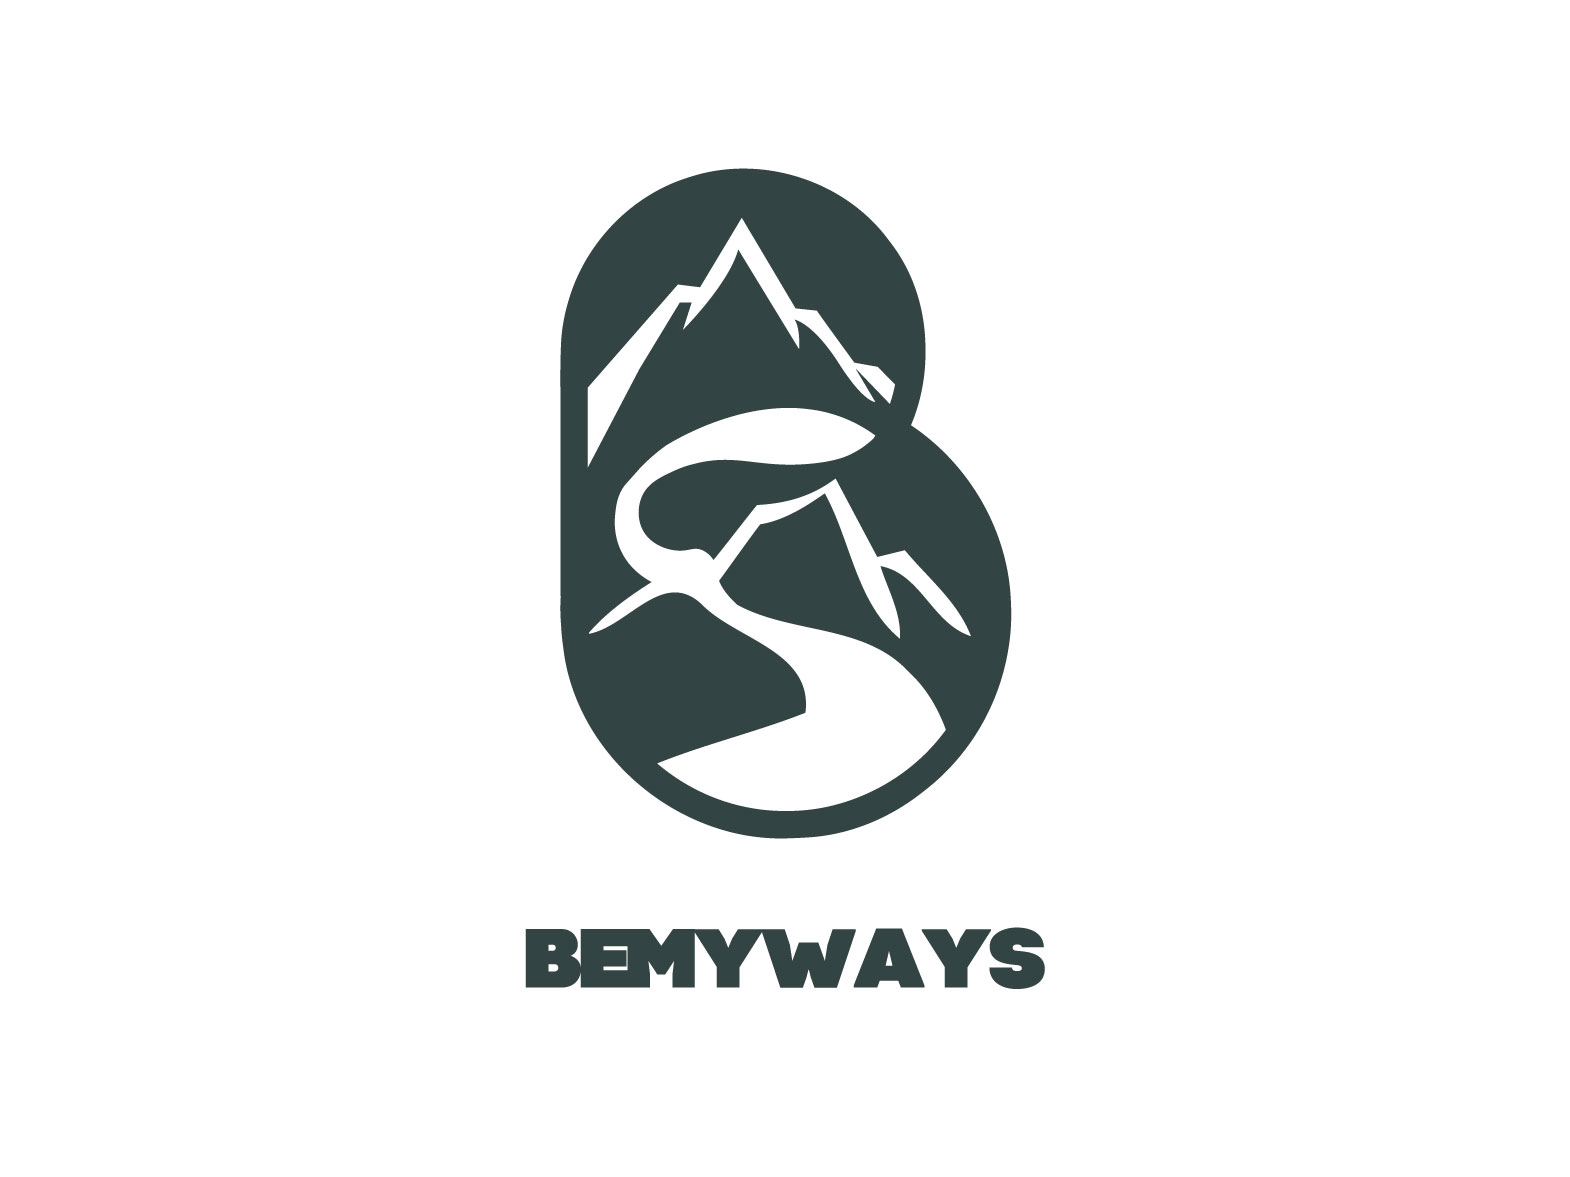 Разработка логотипа и иконки для Travel Video Platform фото f_7465c3975ed75e12.jpg